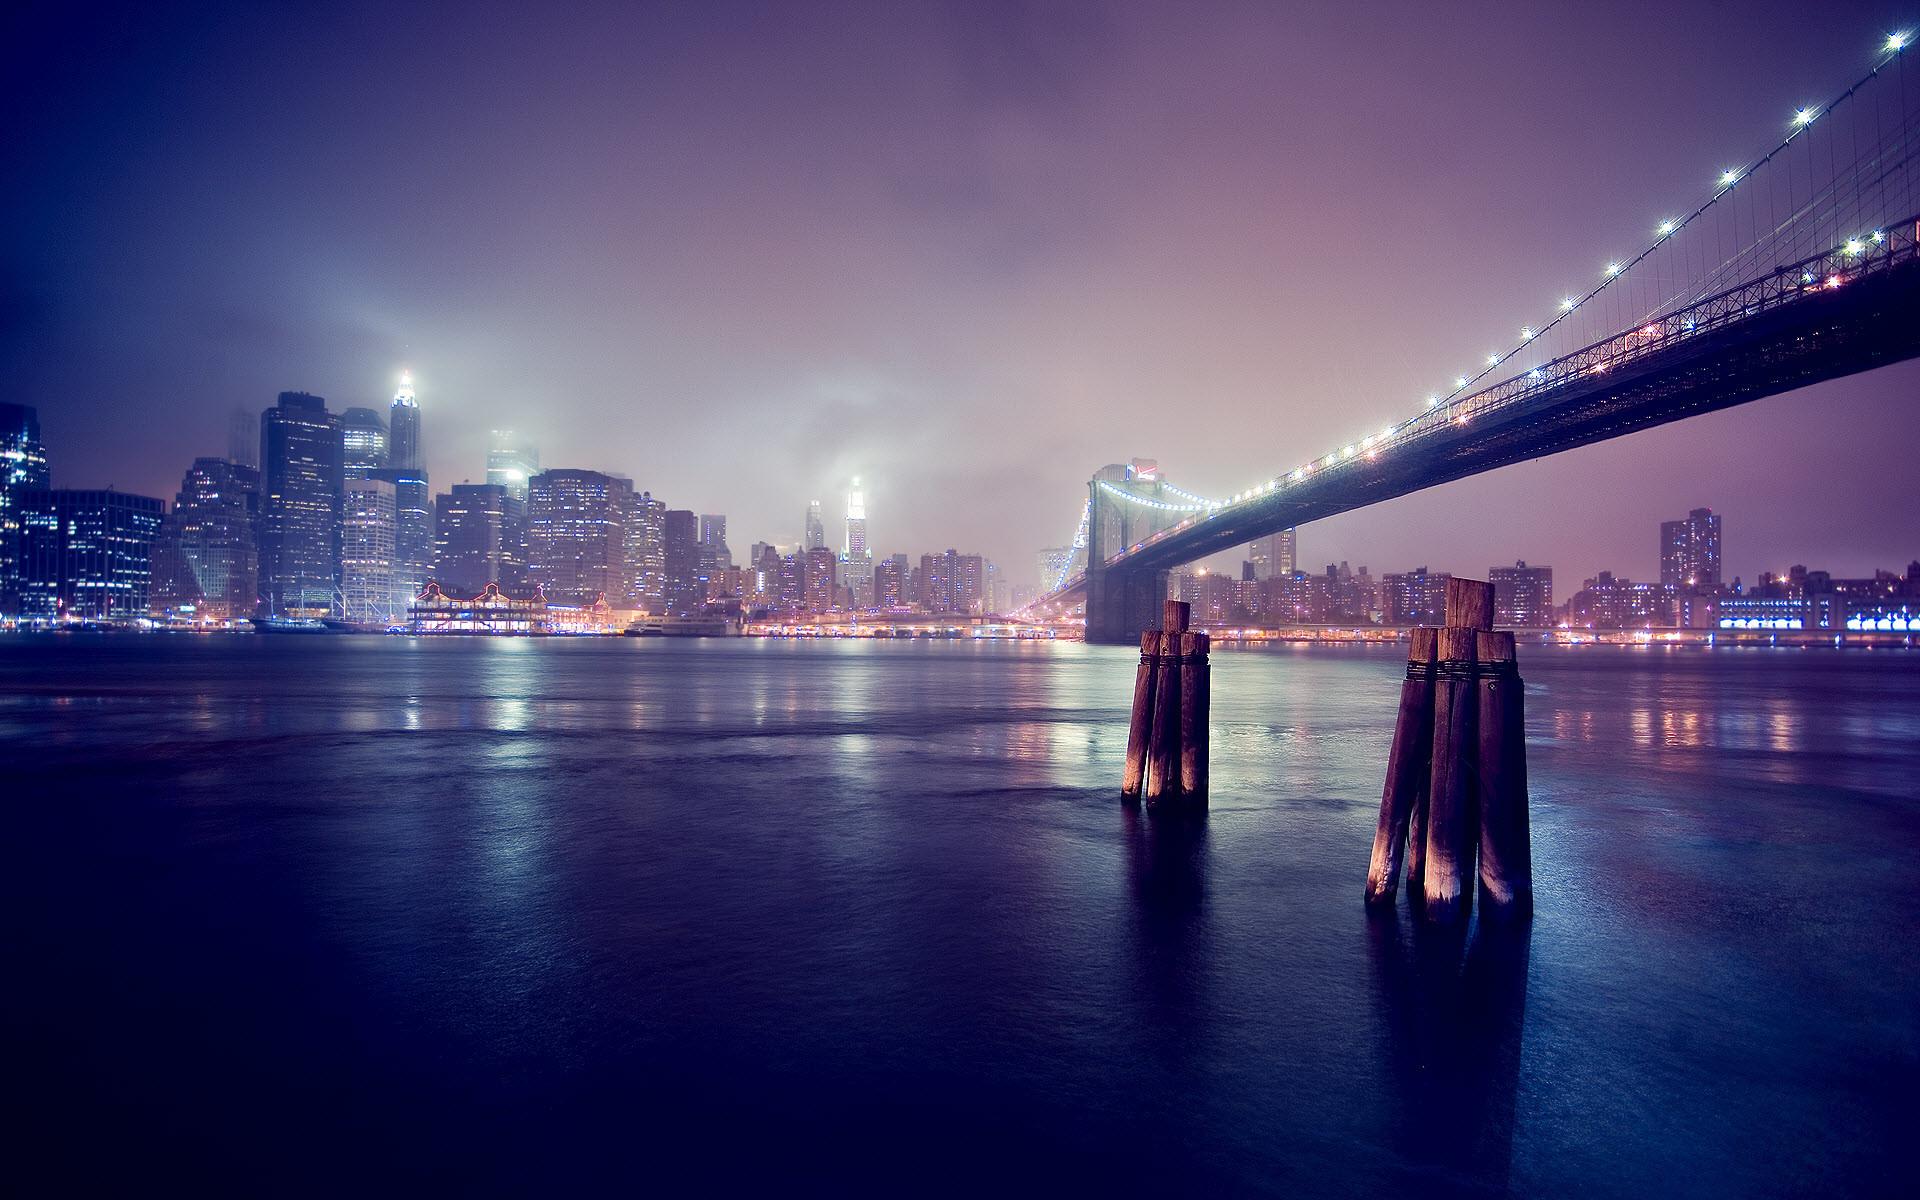 city night wallpaper hd (72+ images)